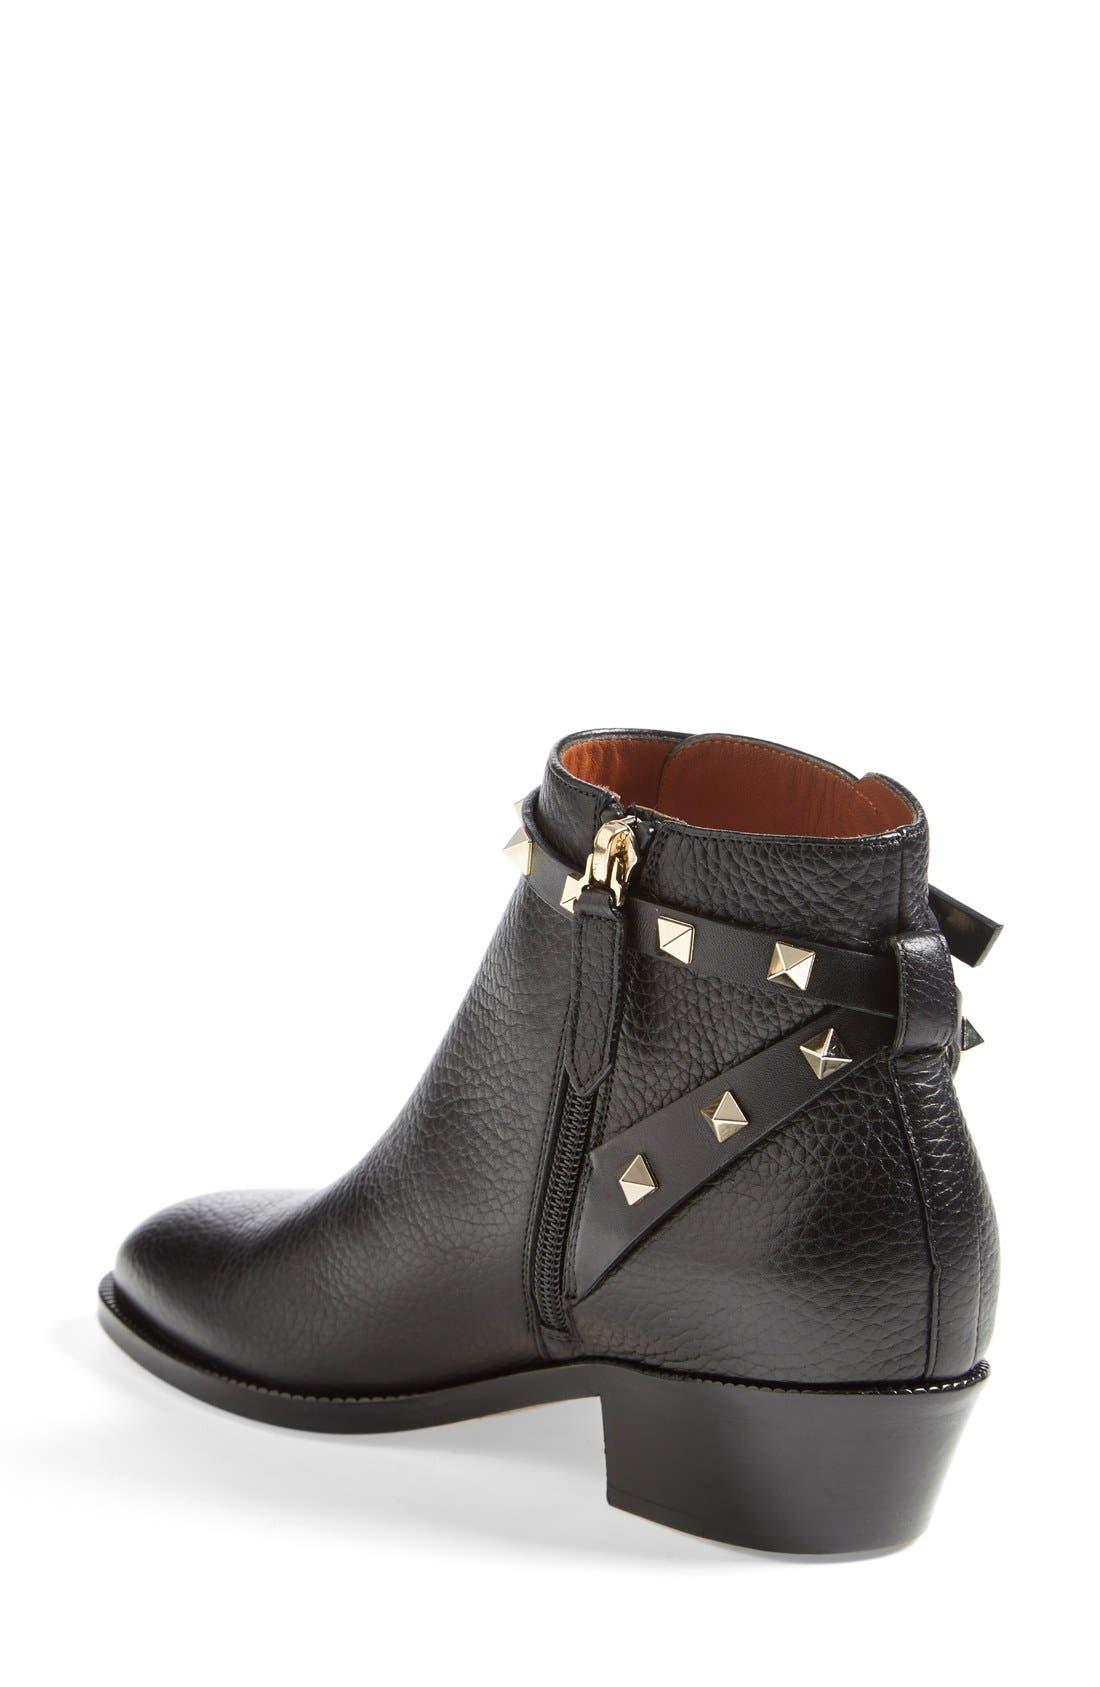 Alternate Image 2  - VALENTINO GARAVANI 'Rockstud' Ankle Boot (Women)